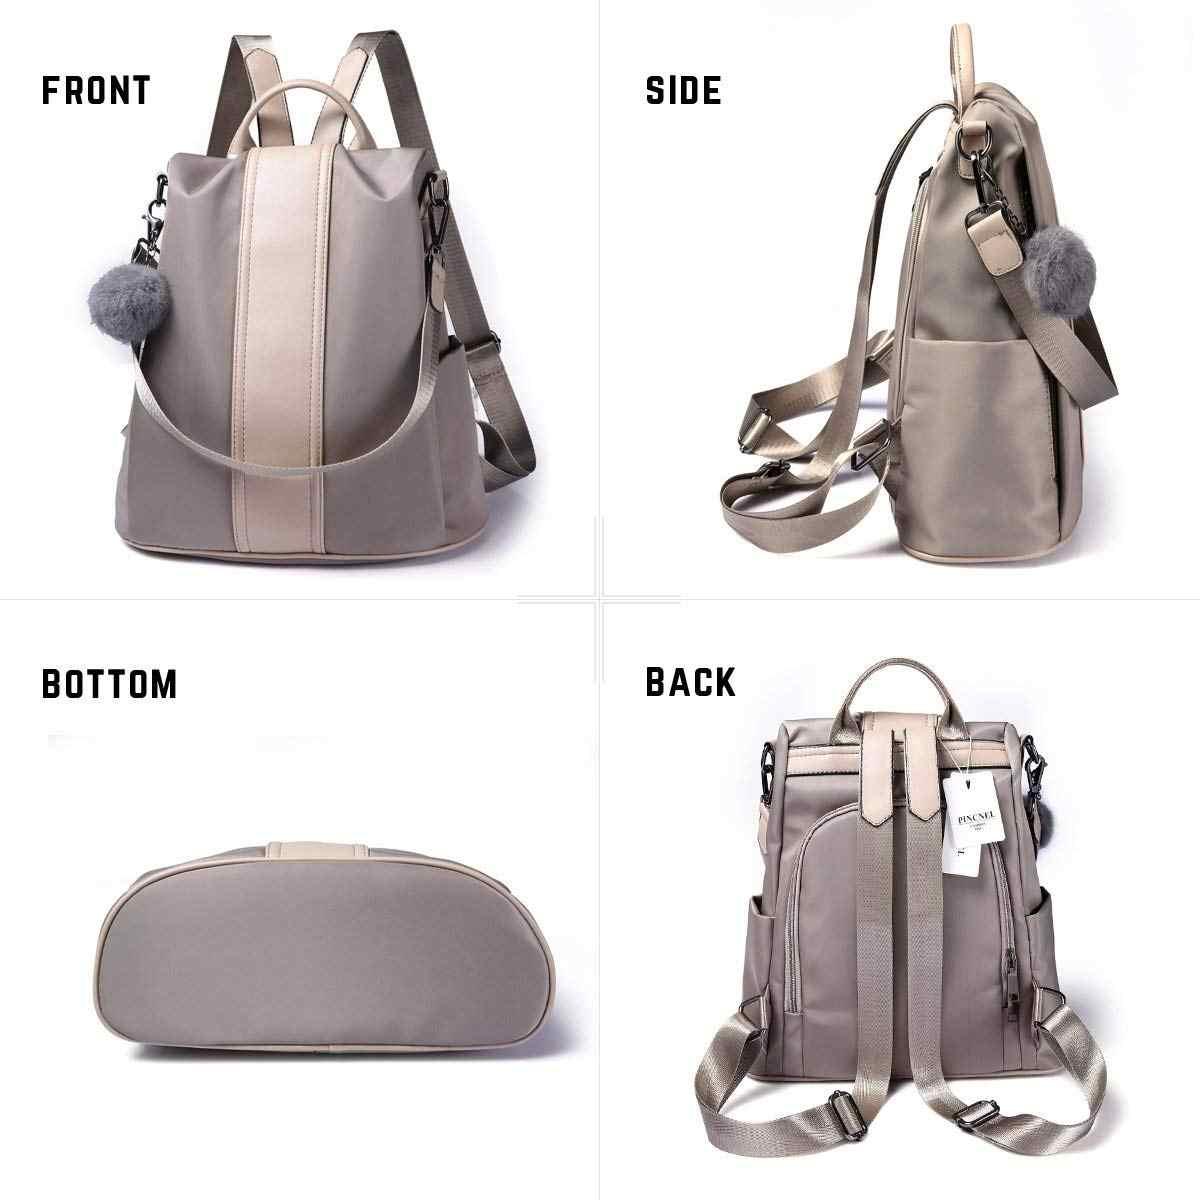 6cc7e9ebeafd ... Women Backpack Purse Waterproof Anti-theft Rucksack Lightweight School  Shoulder Bag ...